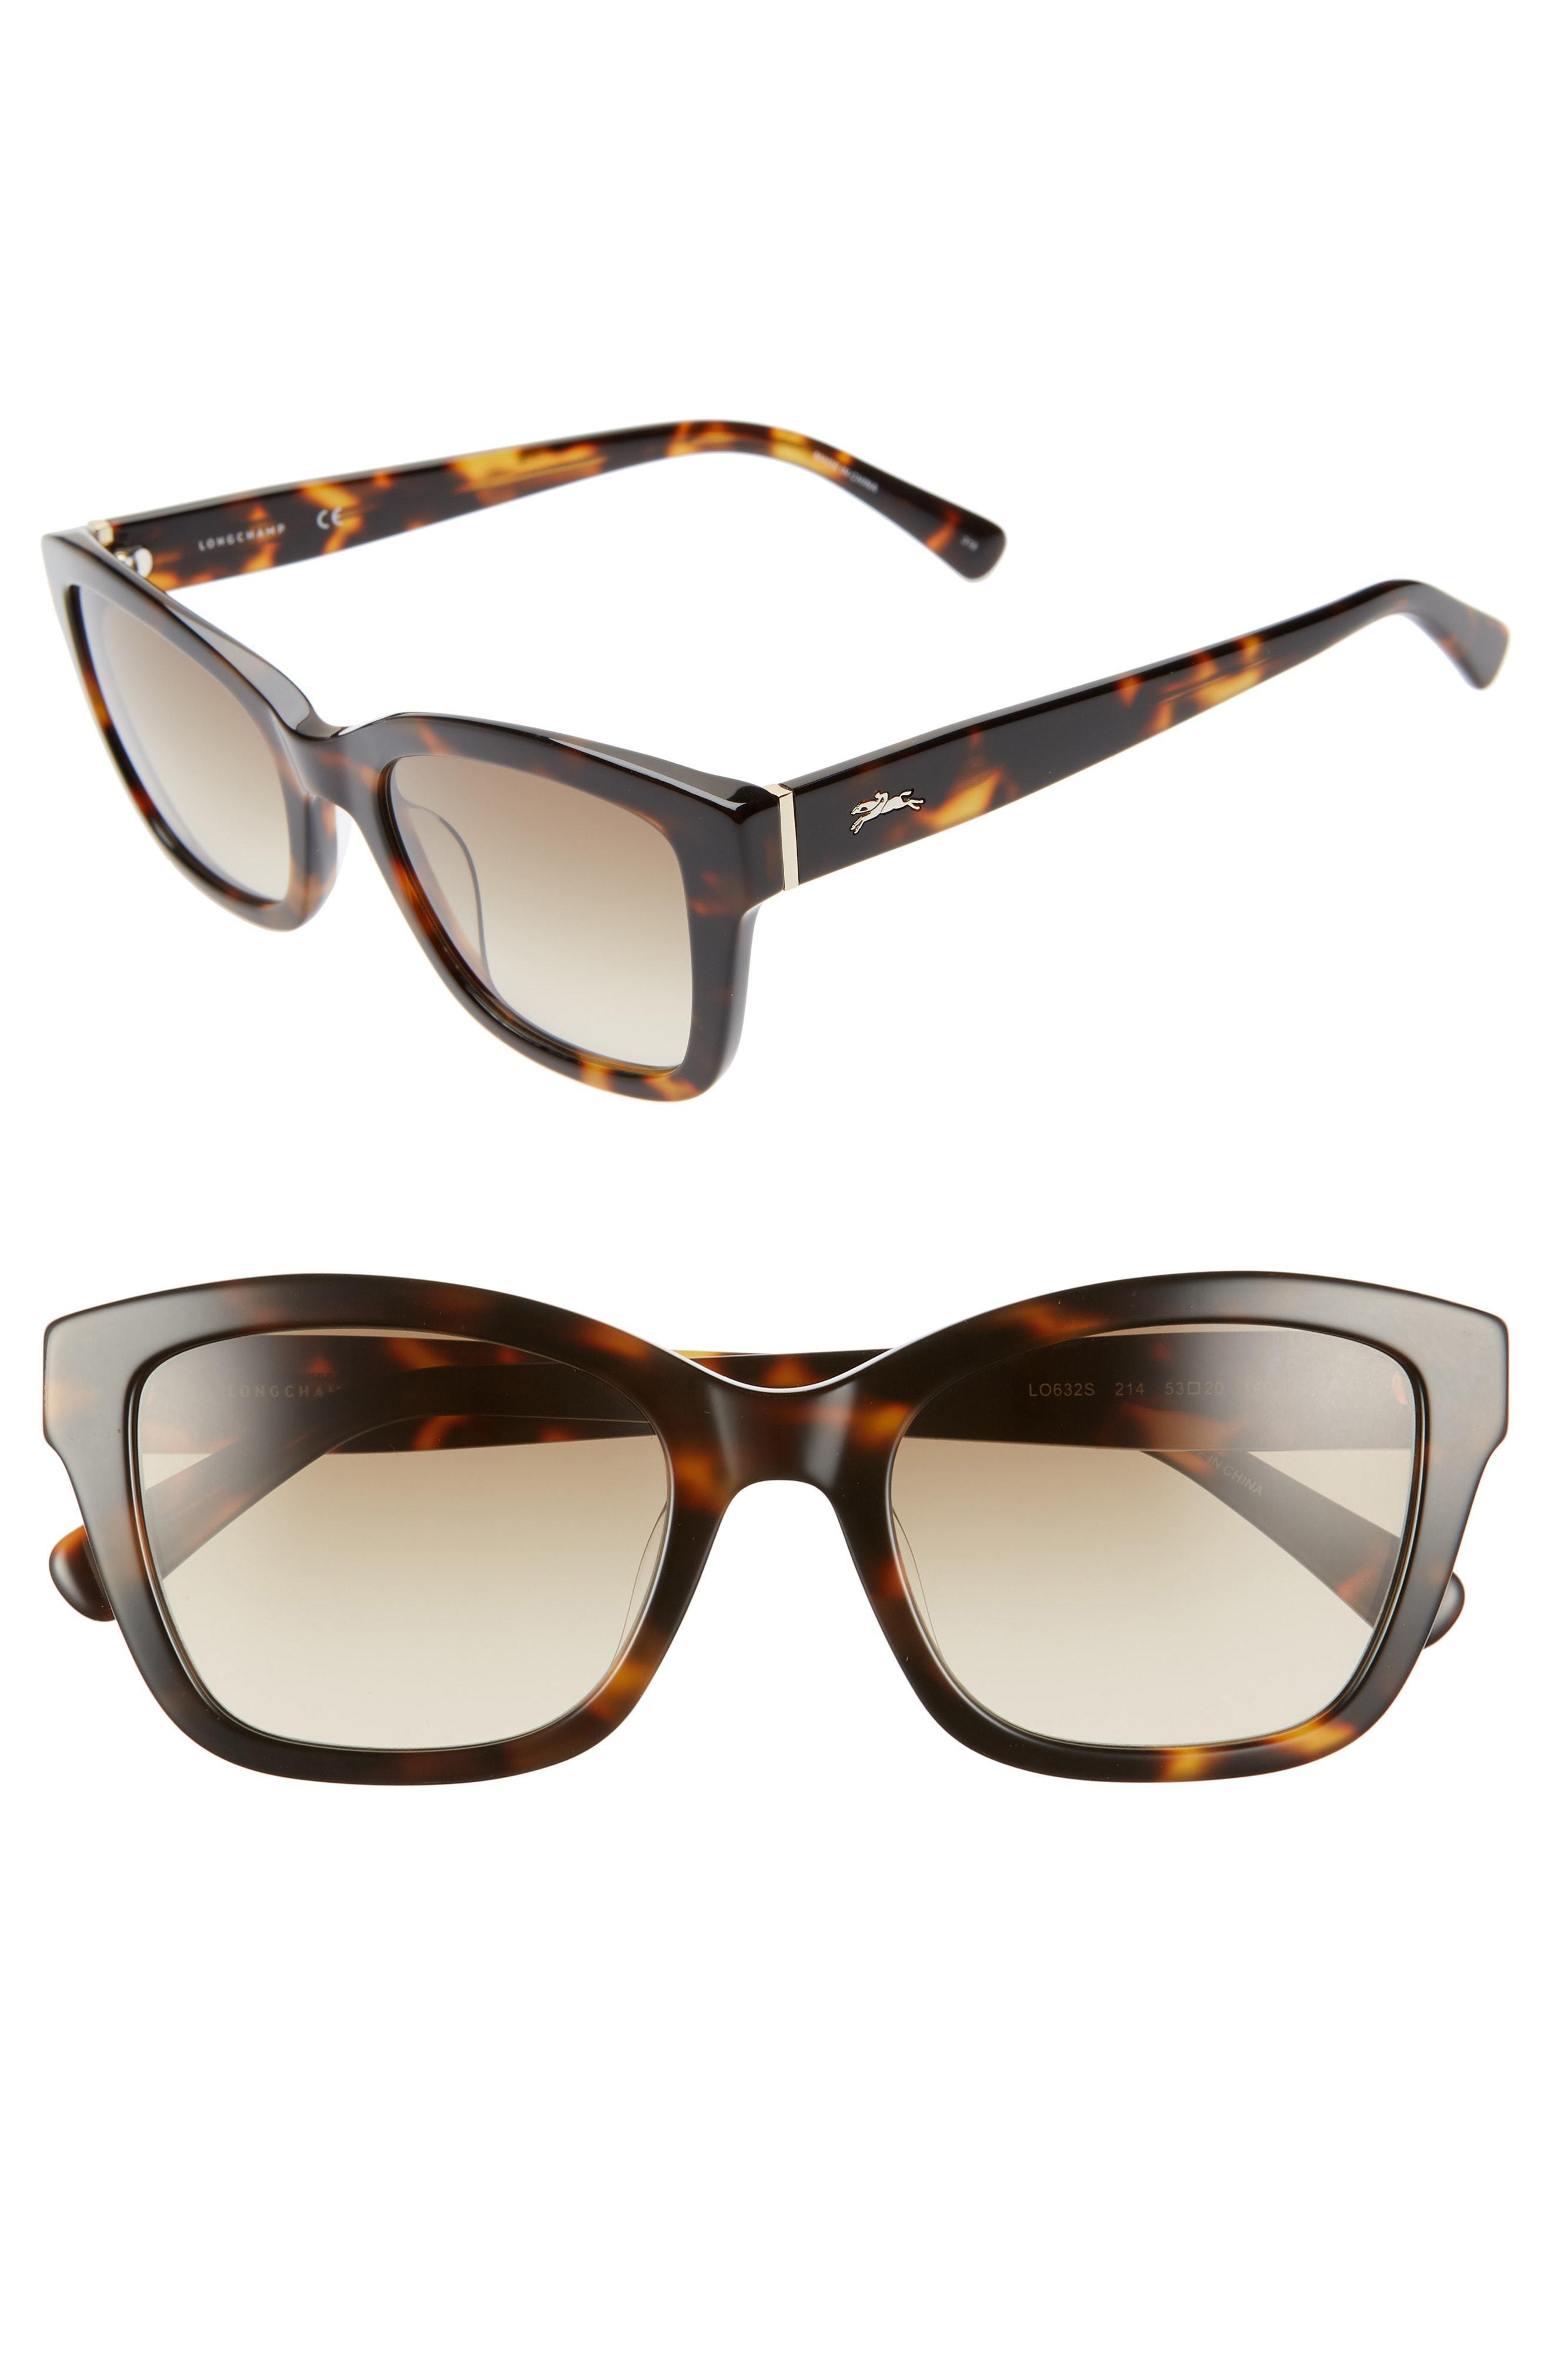 cf7f615e8ecf Lyst - Longchamp Heritage 53mm Square Sunglasses - Havana in Brown ...